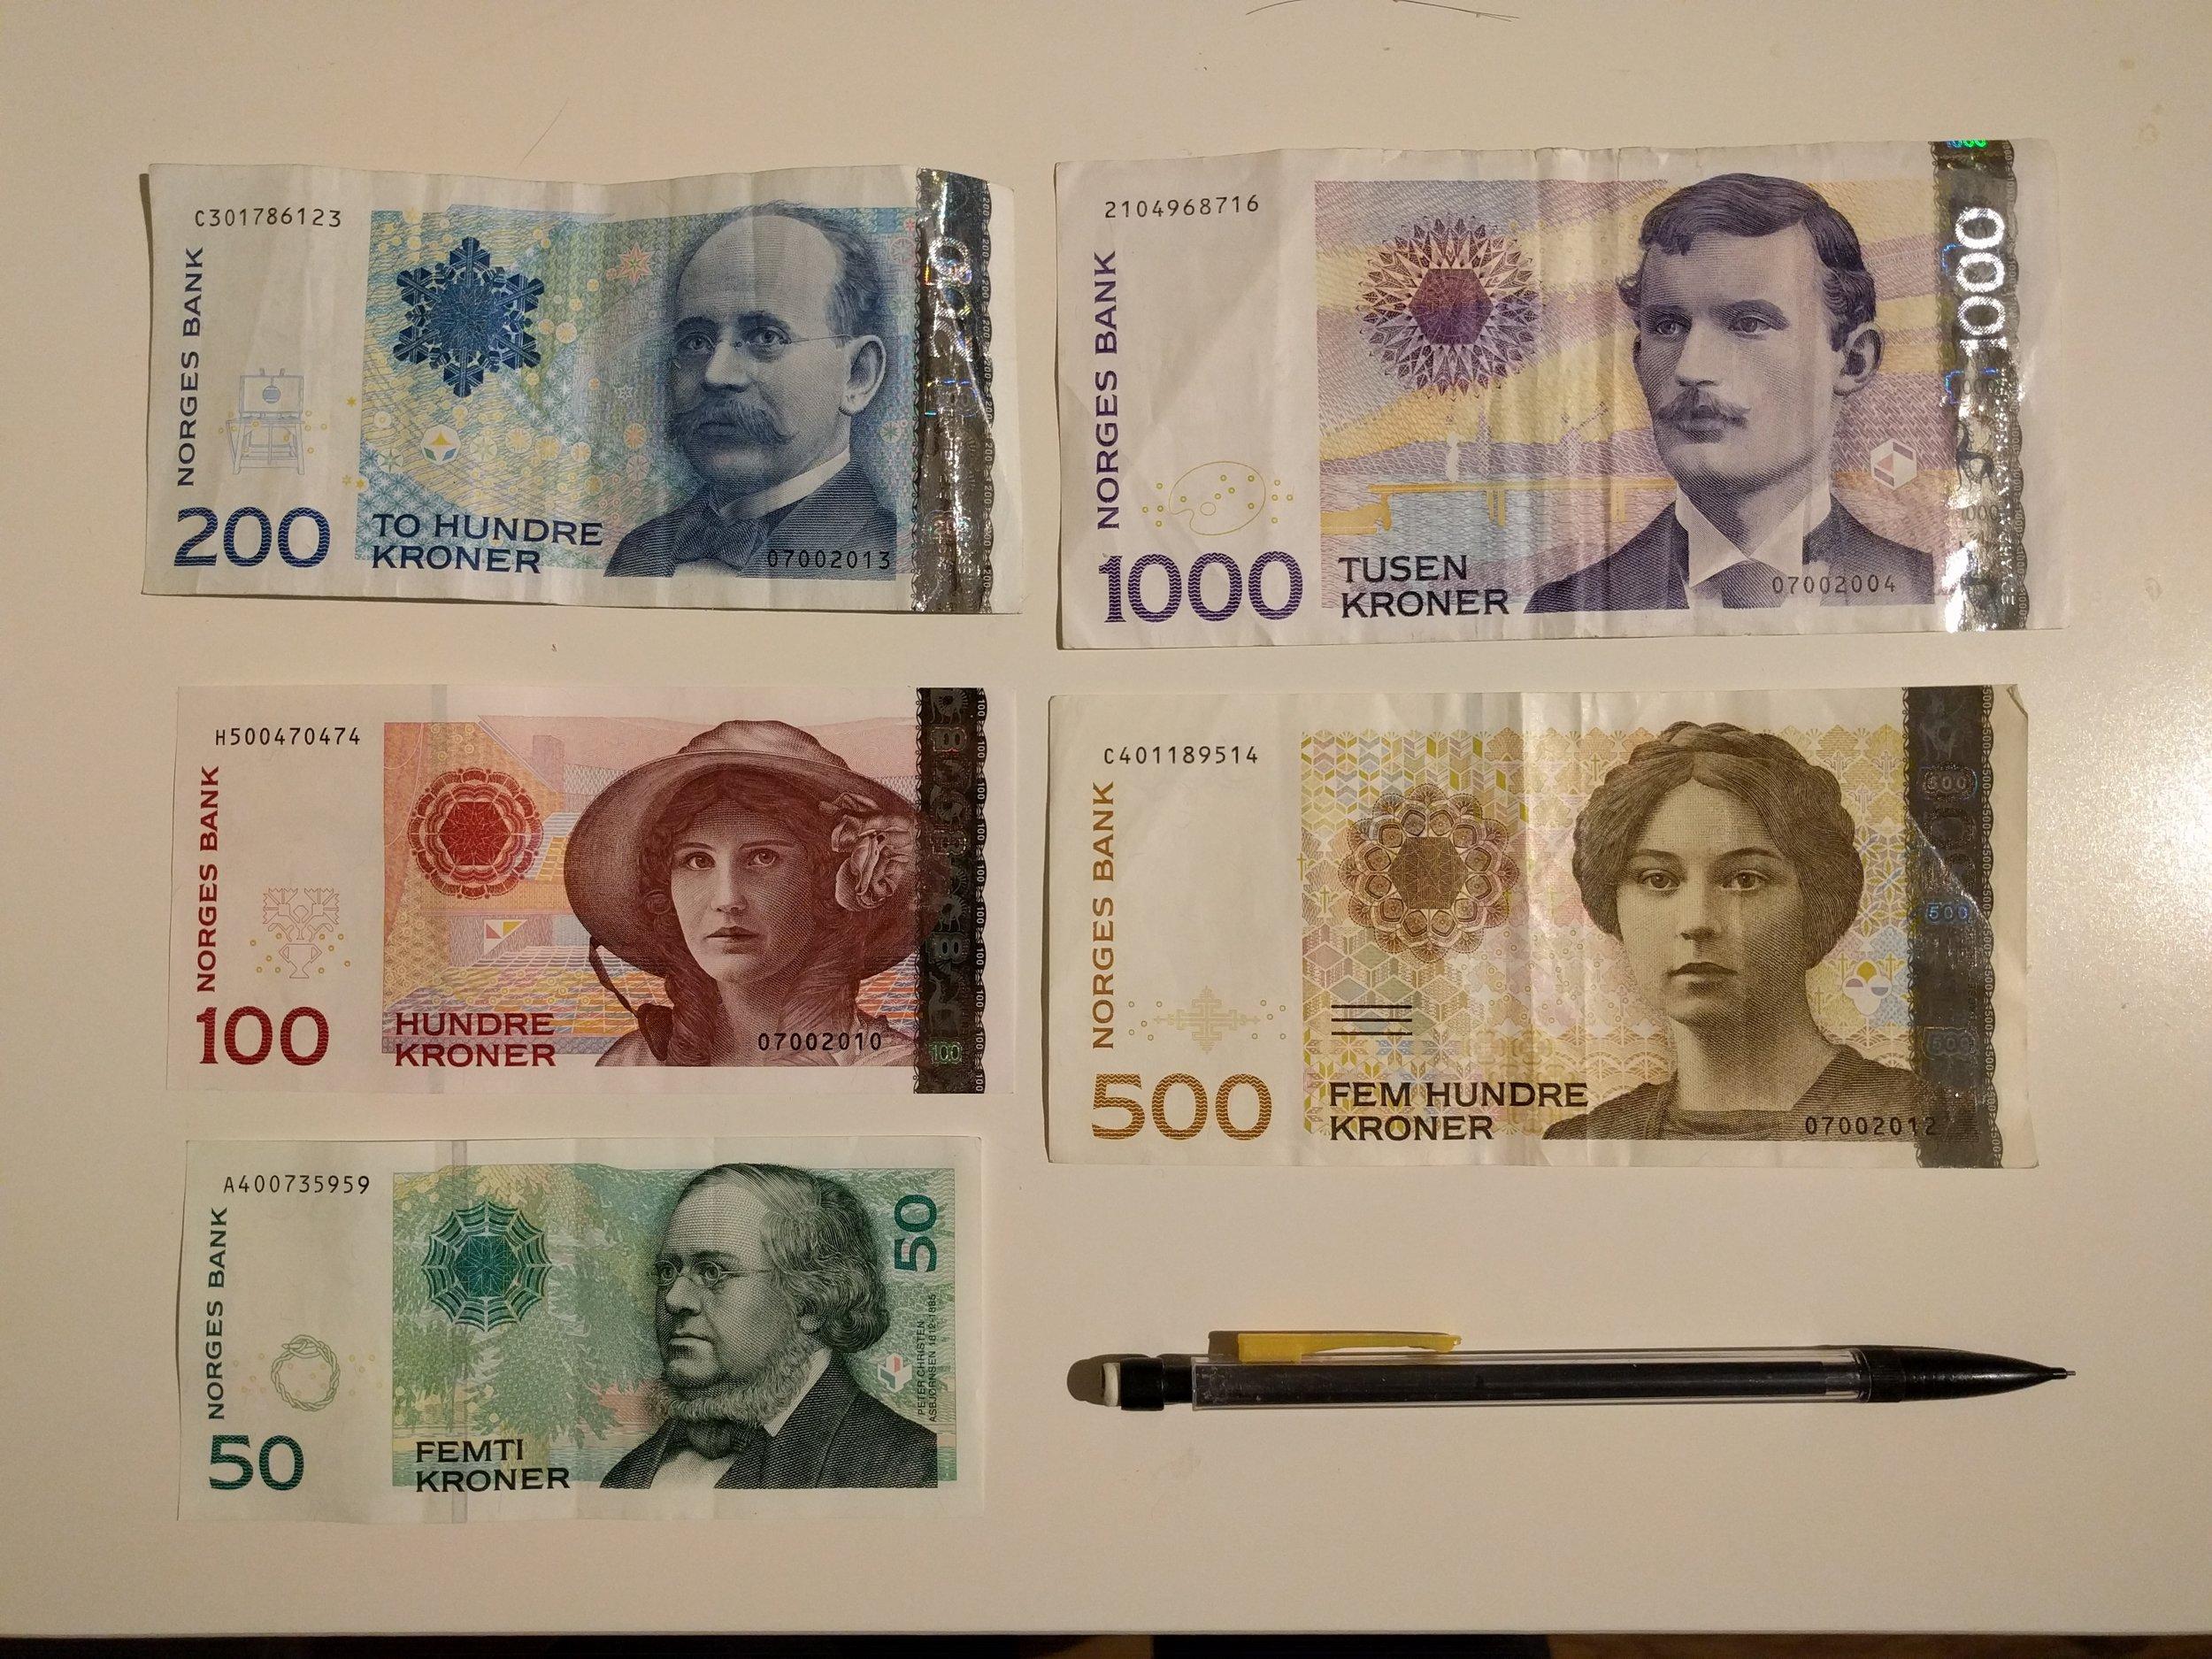 Scandinavium 6 Currency Part 1 Postdocpartum